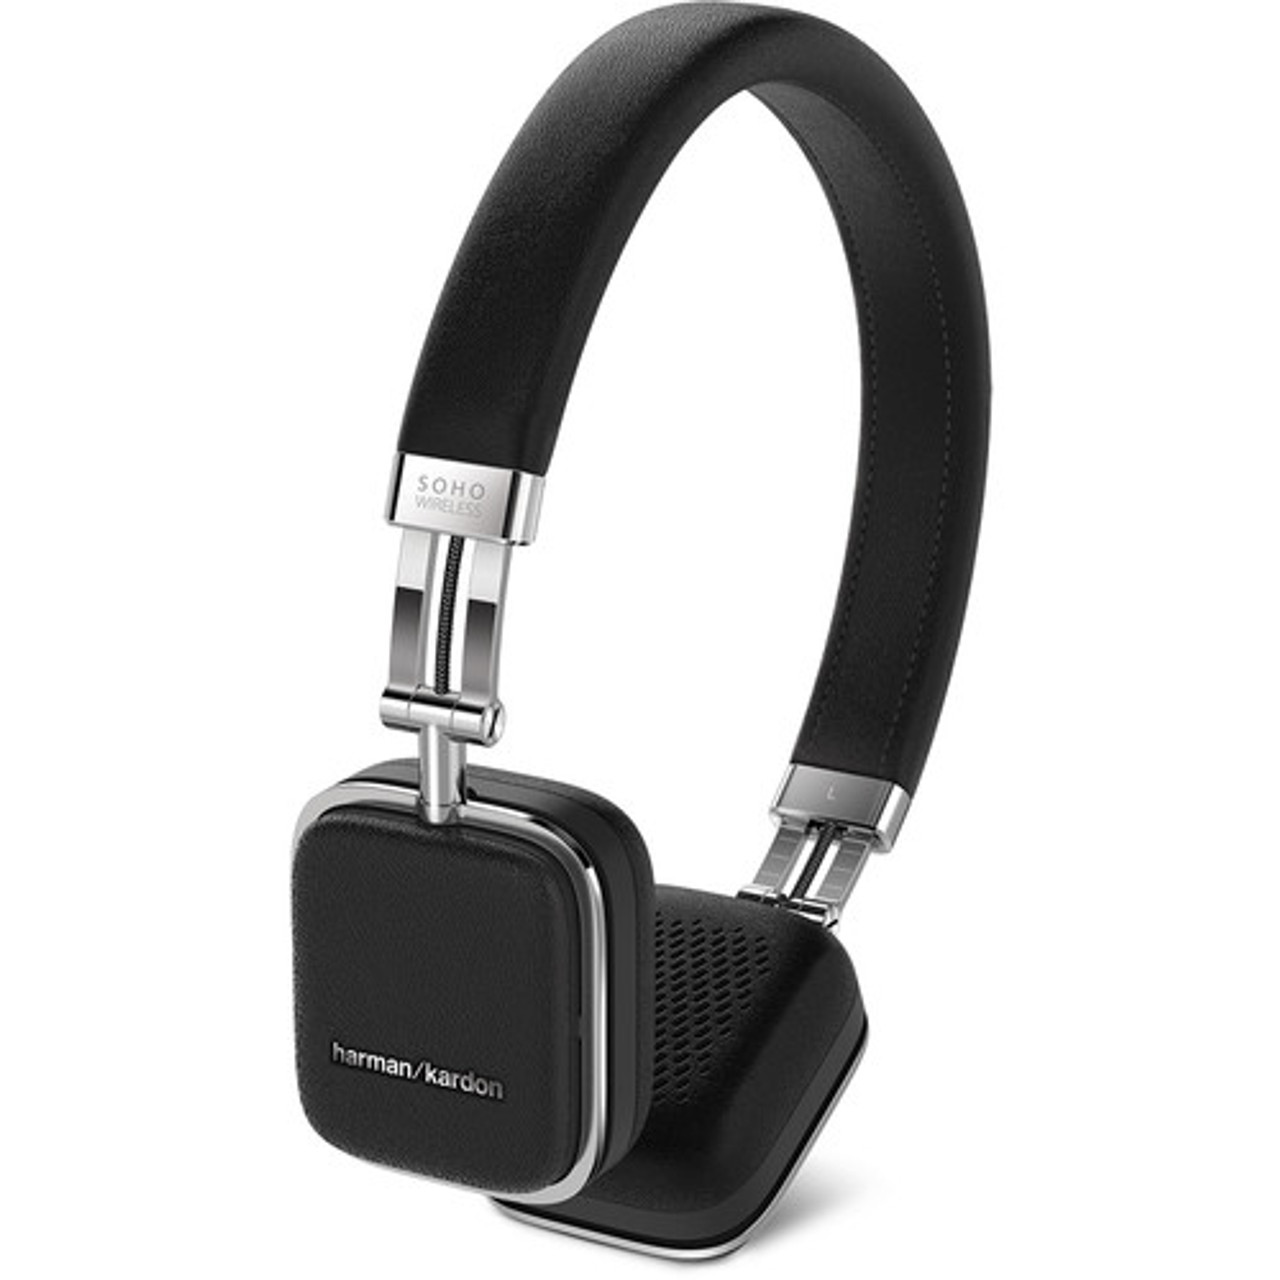 JBL Harman Kardon HKSOHOBTBLK-Z Soho Wireless Headphones - Certified Refurbished